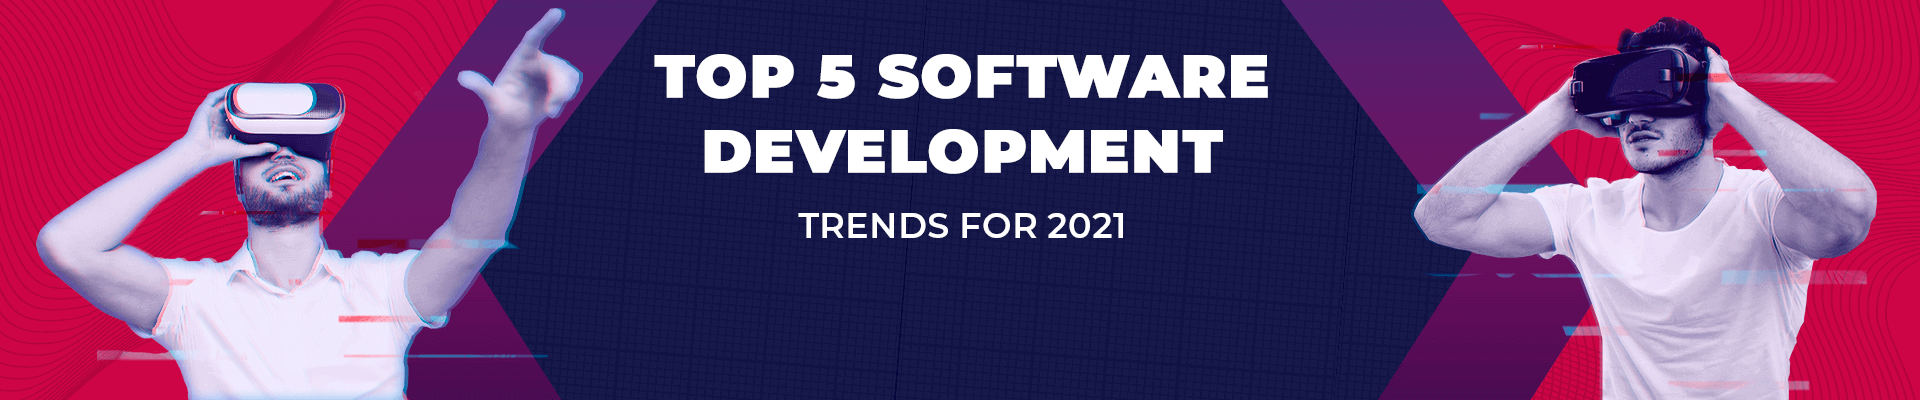 Top 5 Software Development Trends for 2021